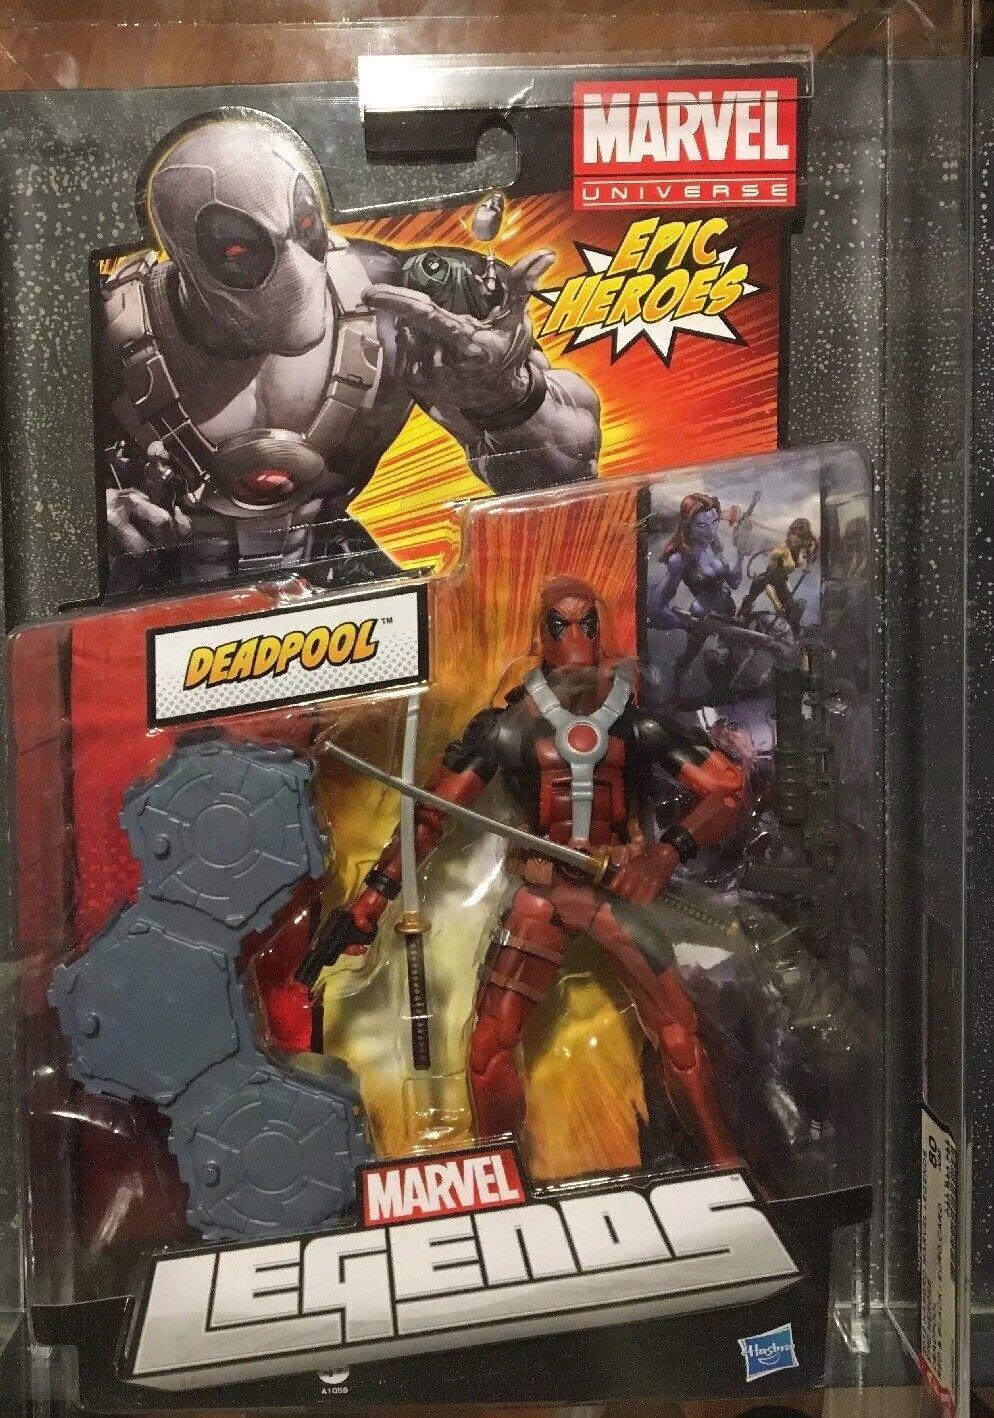 Marvel  Legends Epic Heroes Deadpool rosso Variant 6  azione cifra AFA 80  acquisto limitato